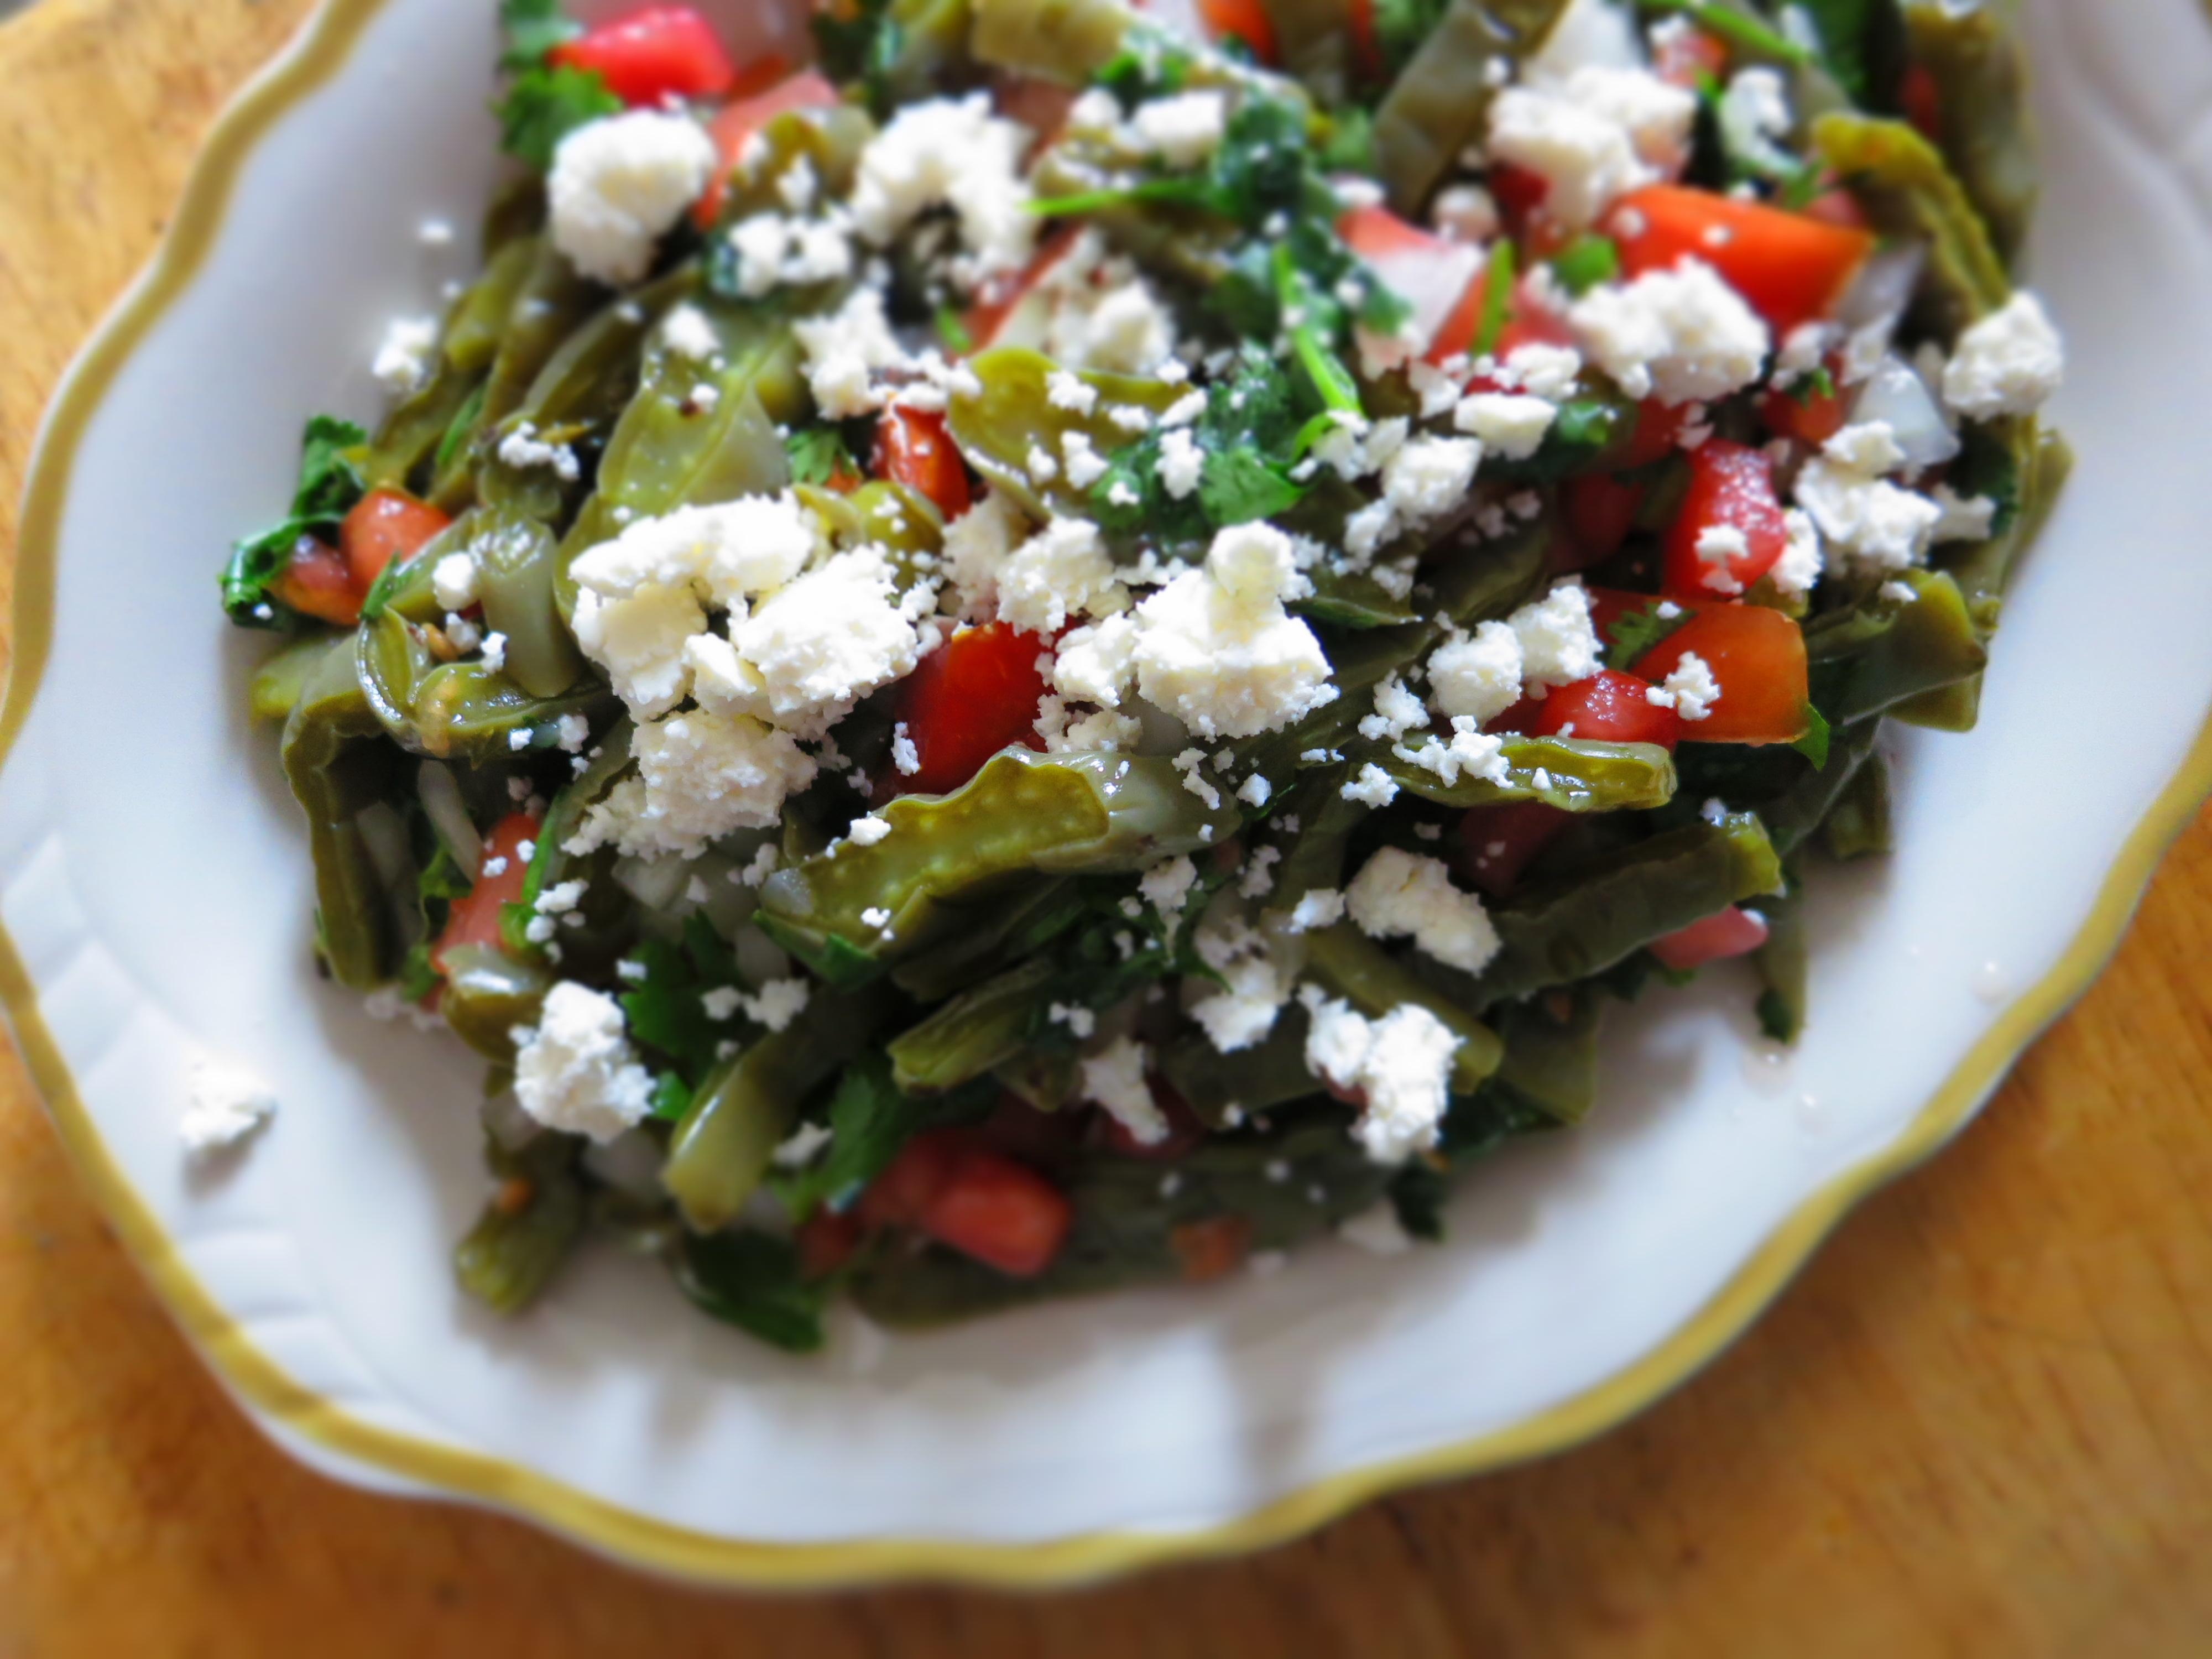 Cactus salad, good for health